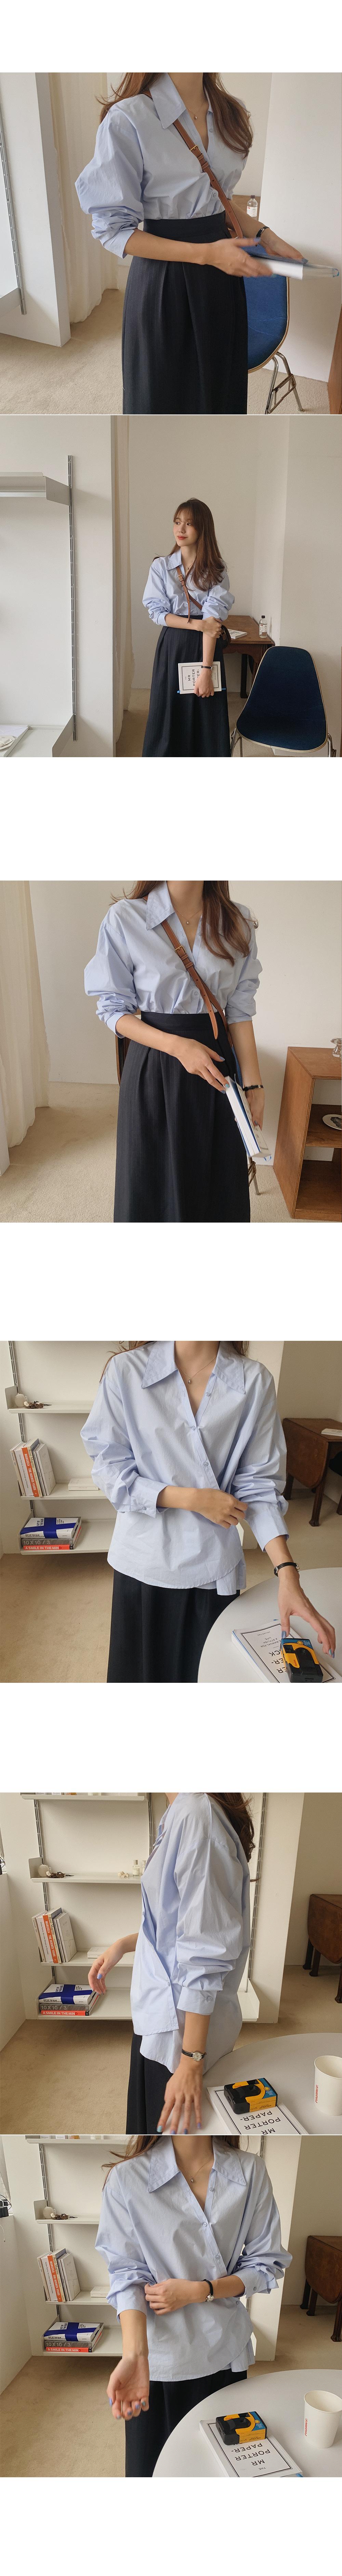 Leviko collar blouse